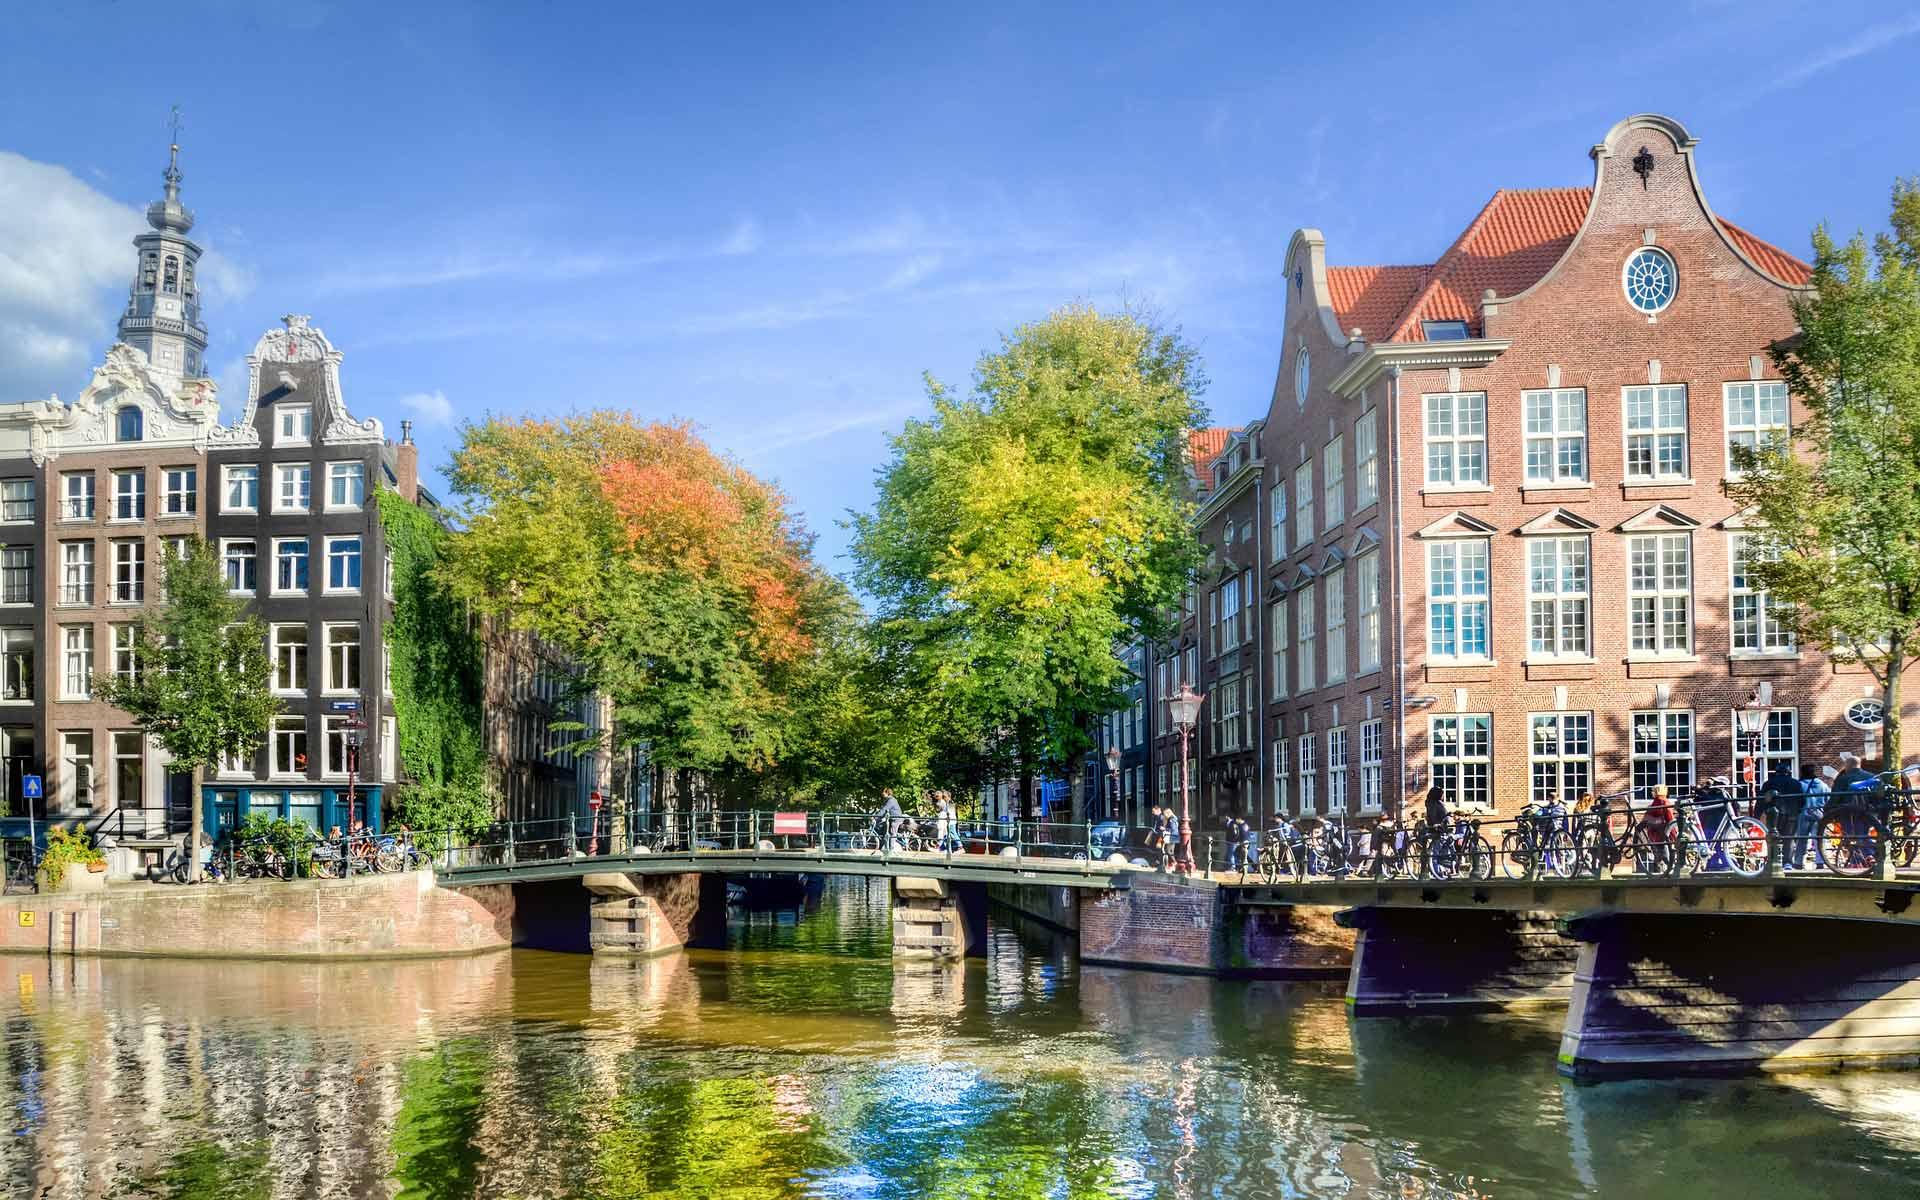 Grachtenfestival Amsterdam